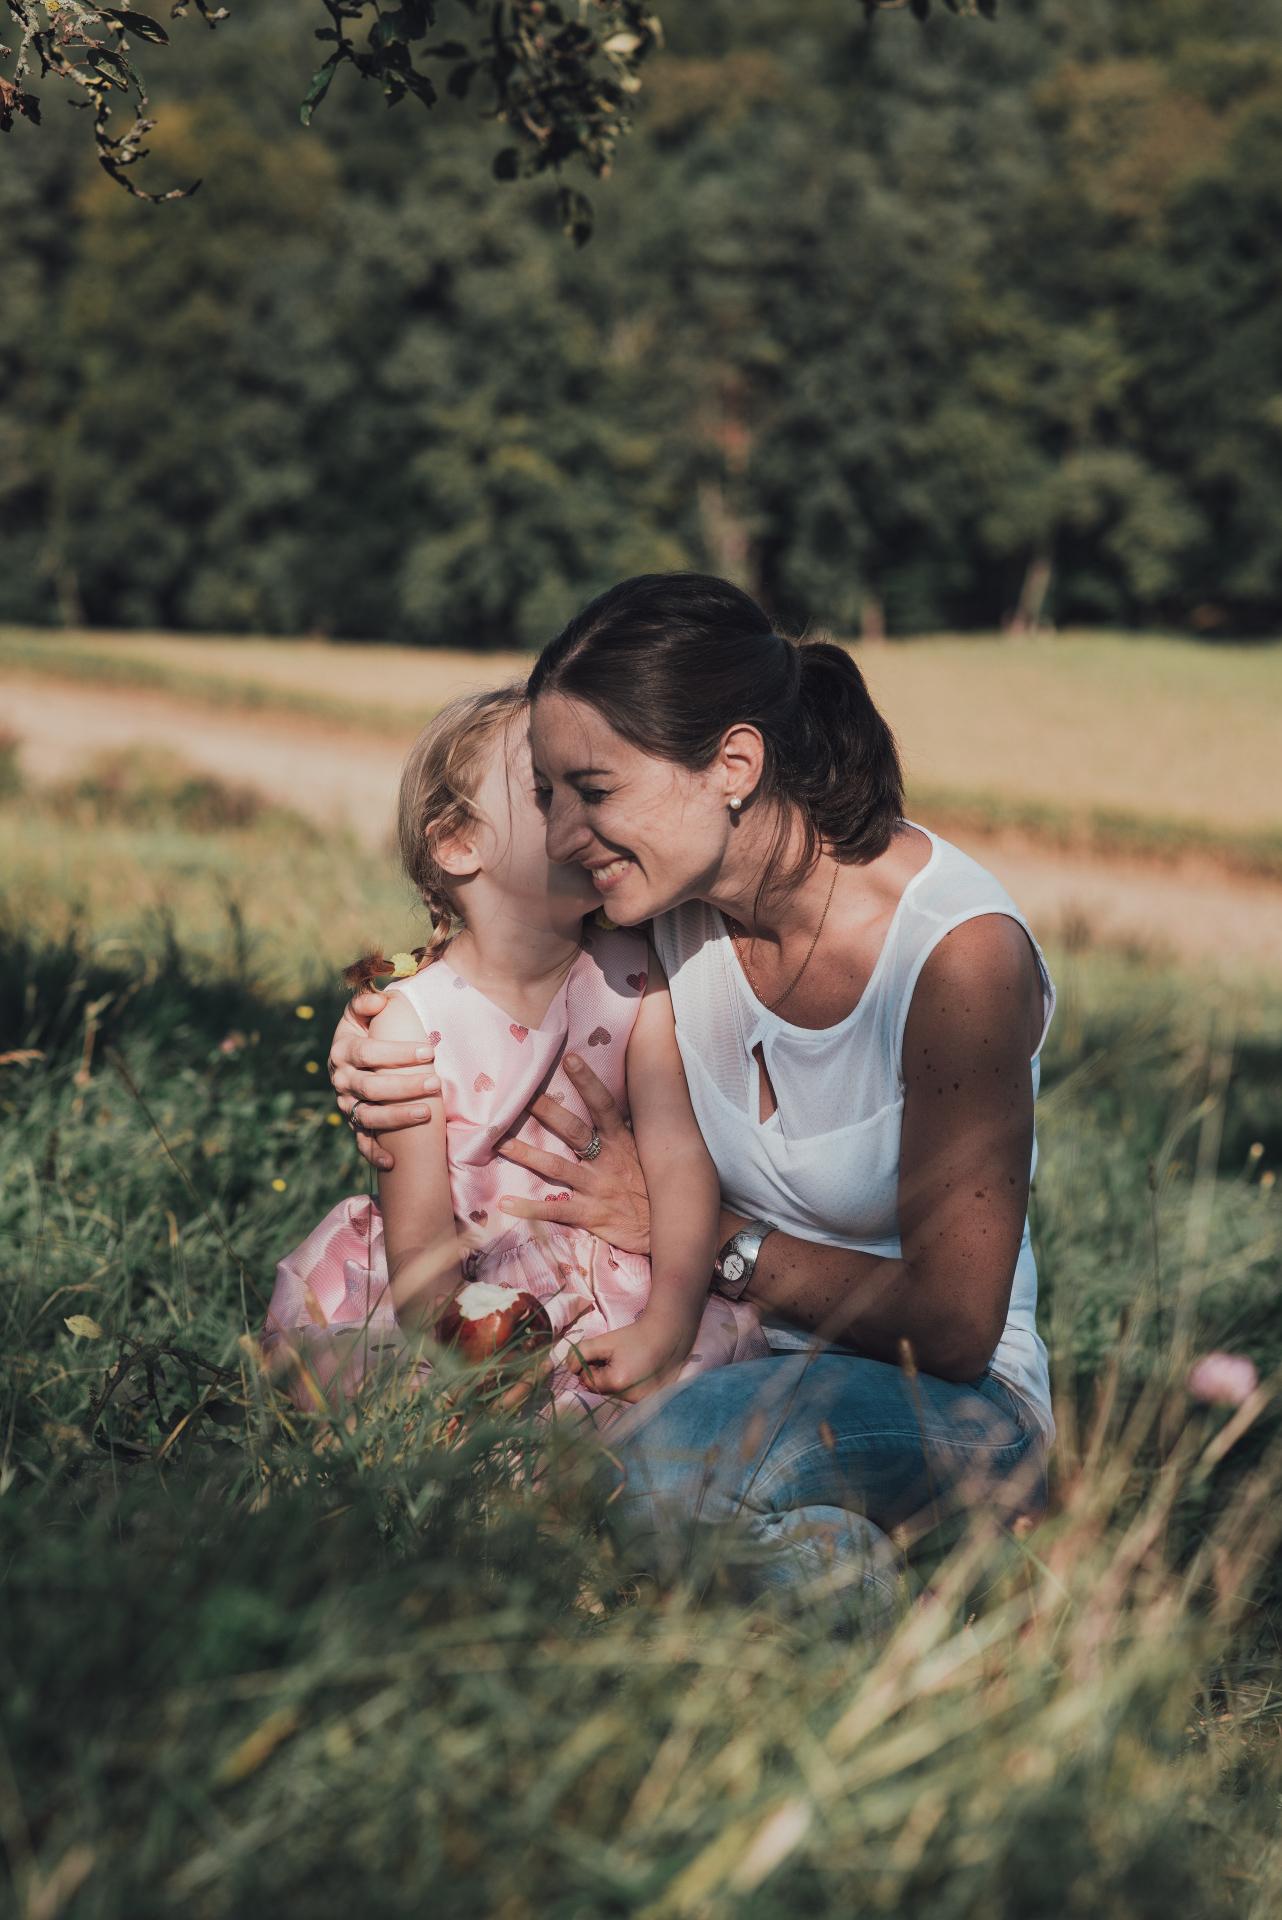 Familienfotoshooting_Kleer_Okt20_klein_92